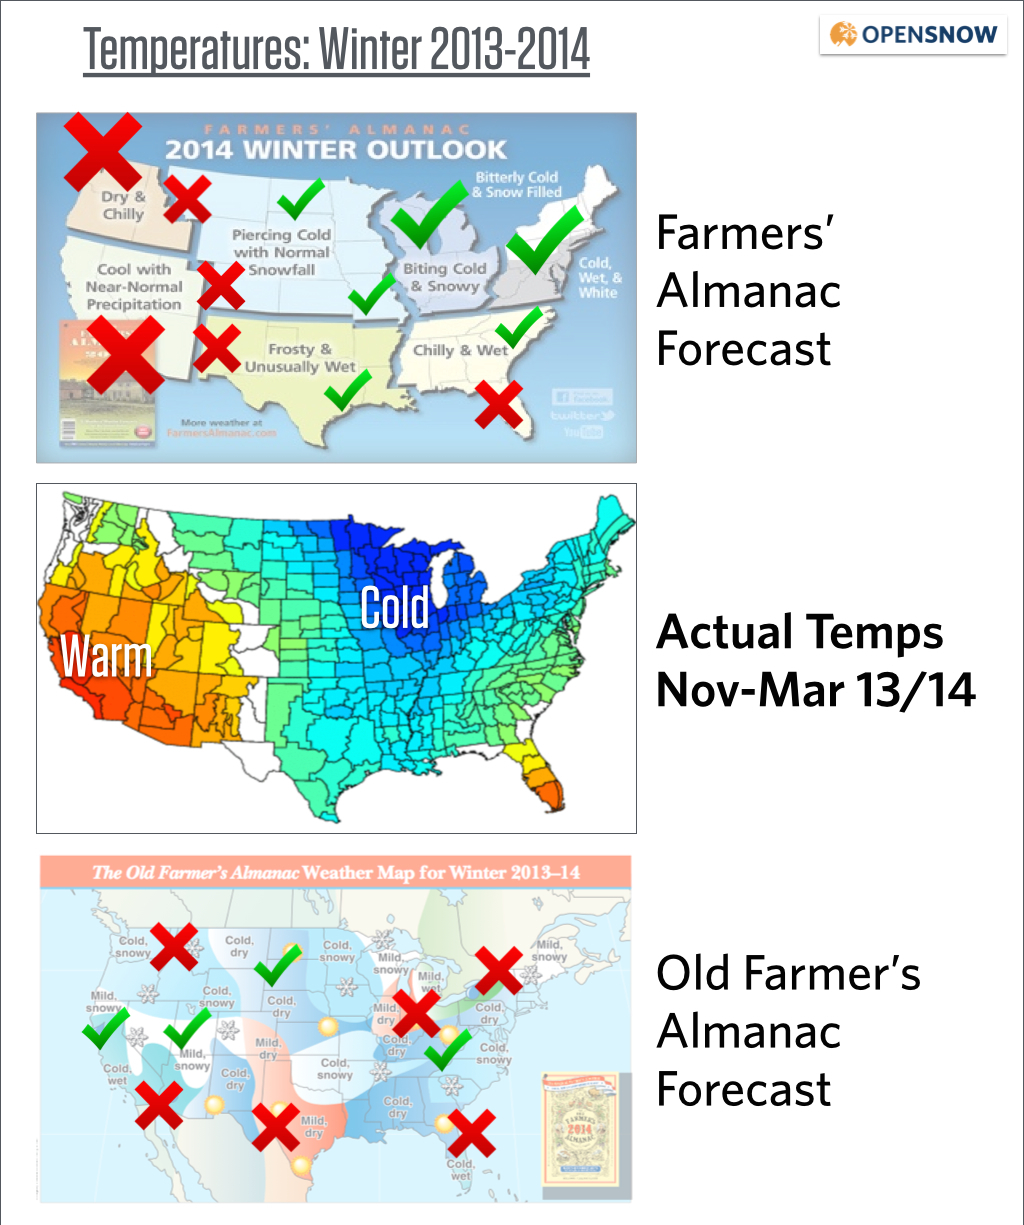 Should we trust the farmers almanac opensnow farmers almanac winter forecast accuracy sciox Gallery